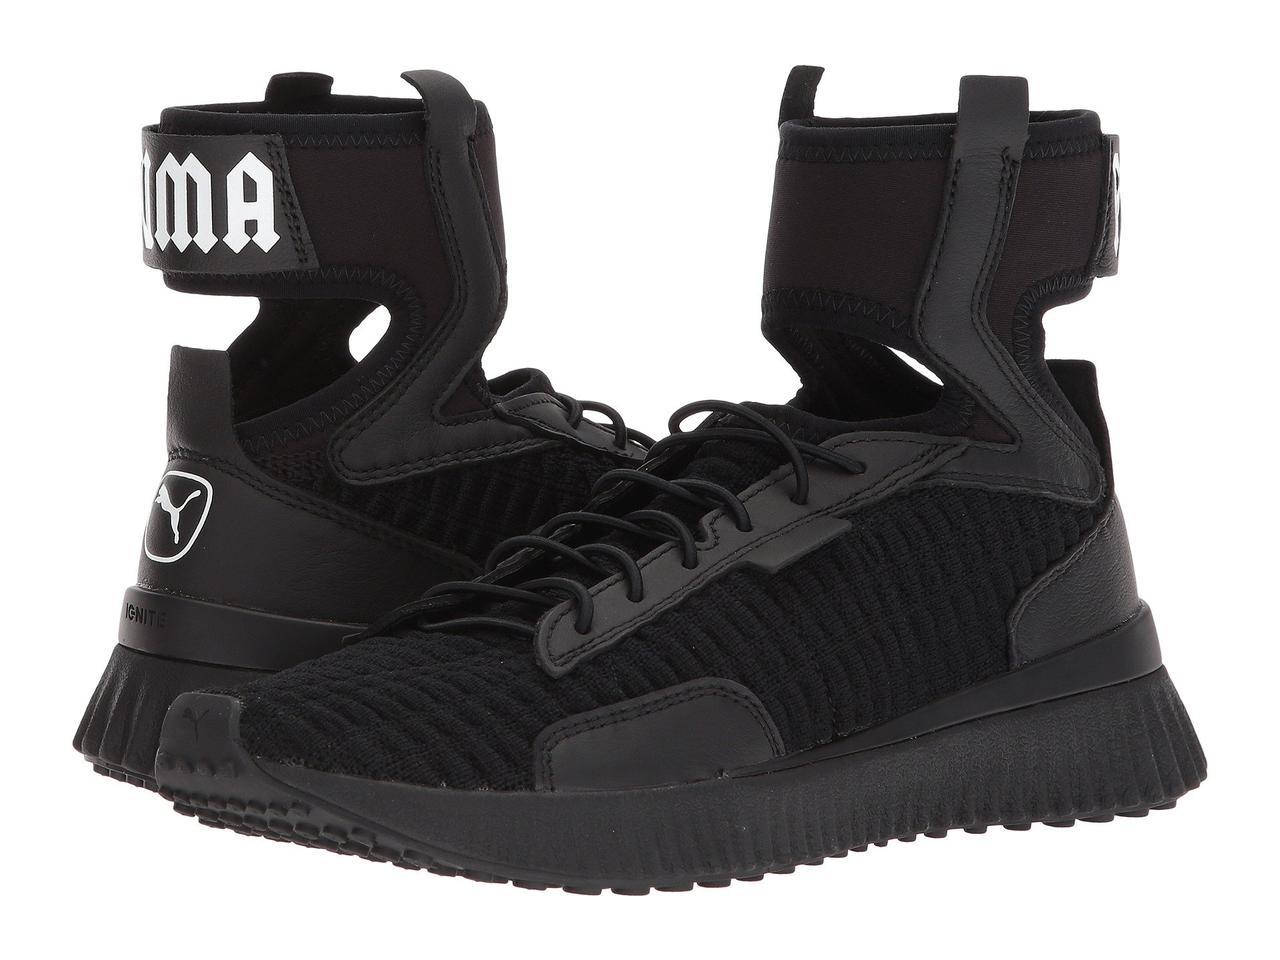 Кроссовки Кеды (Оригинал) PUMA Fenty Trainer Mid Puma Black Puma White - e8ad117e97c